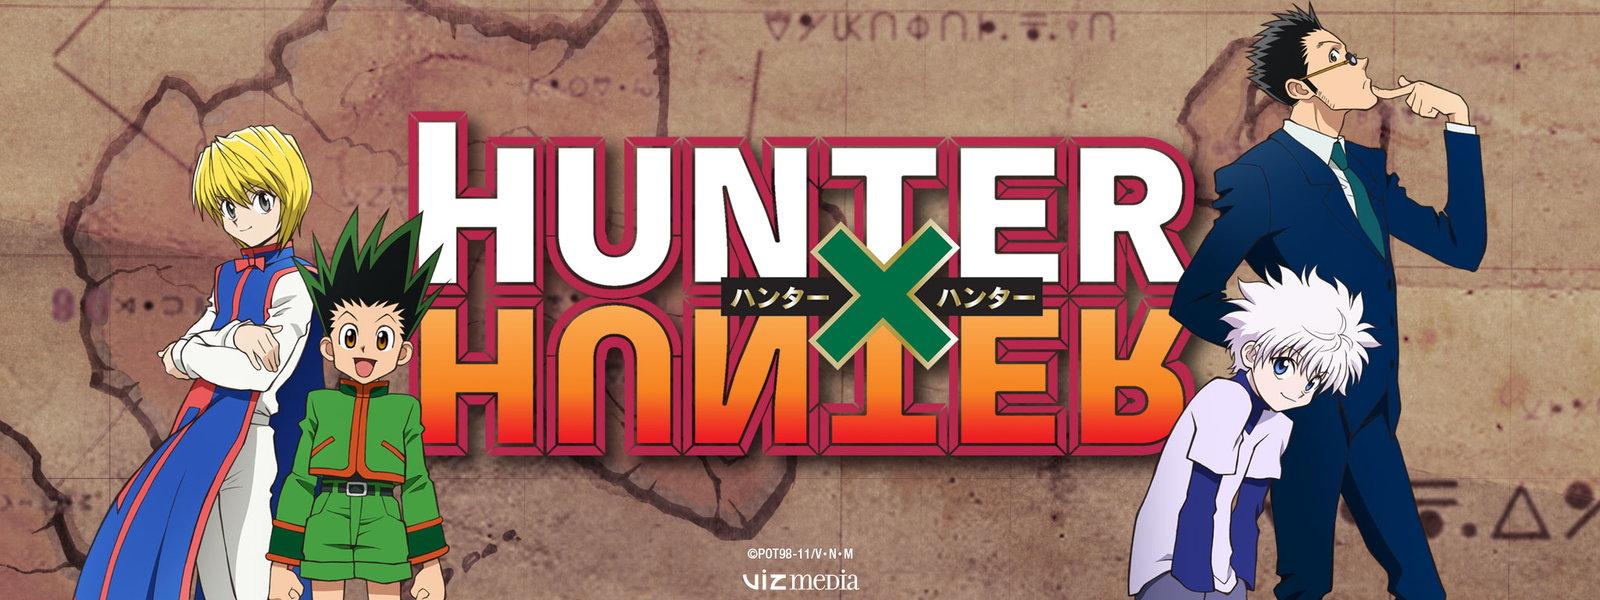 HunterXHunter banner